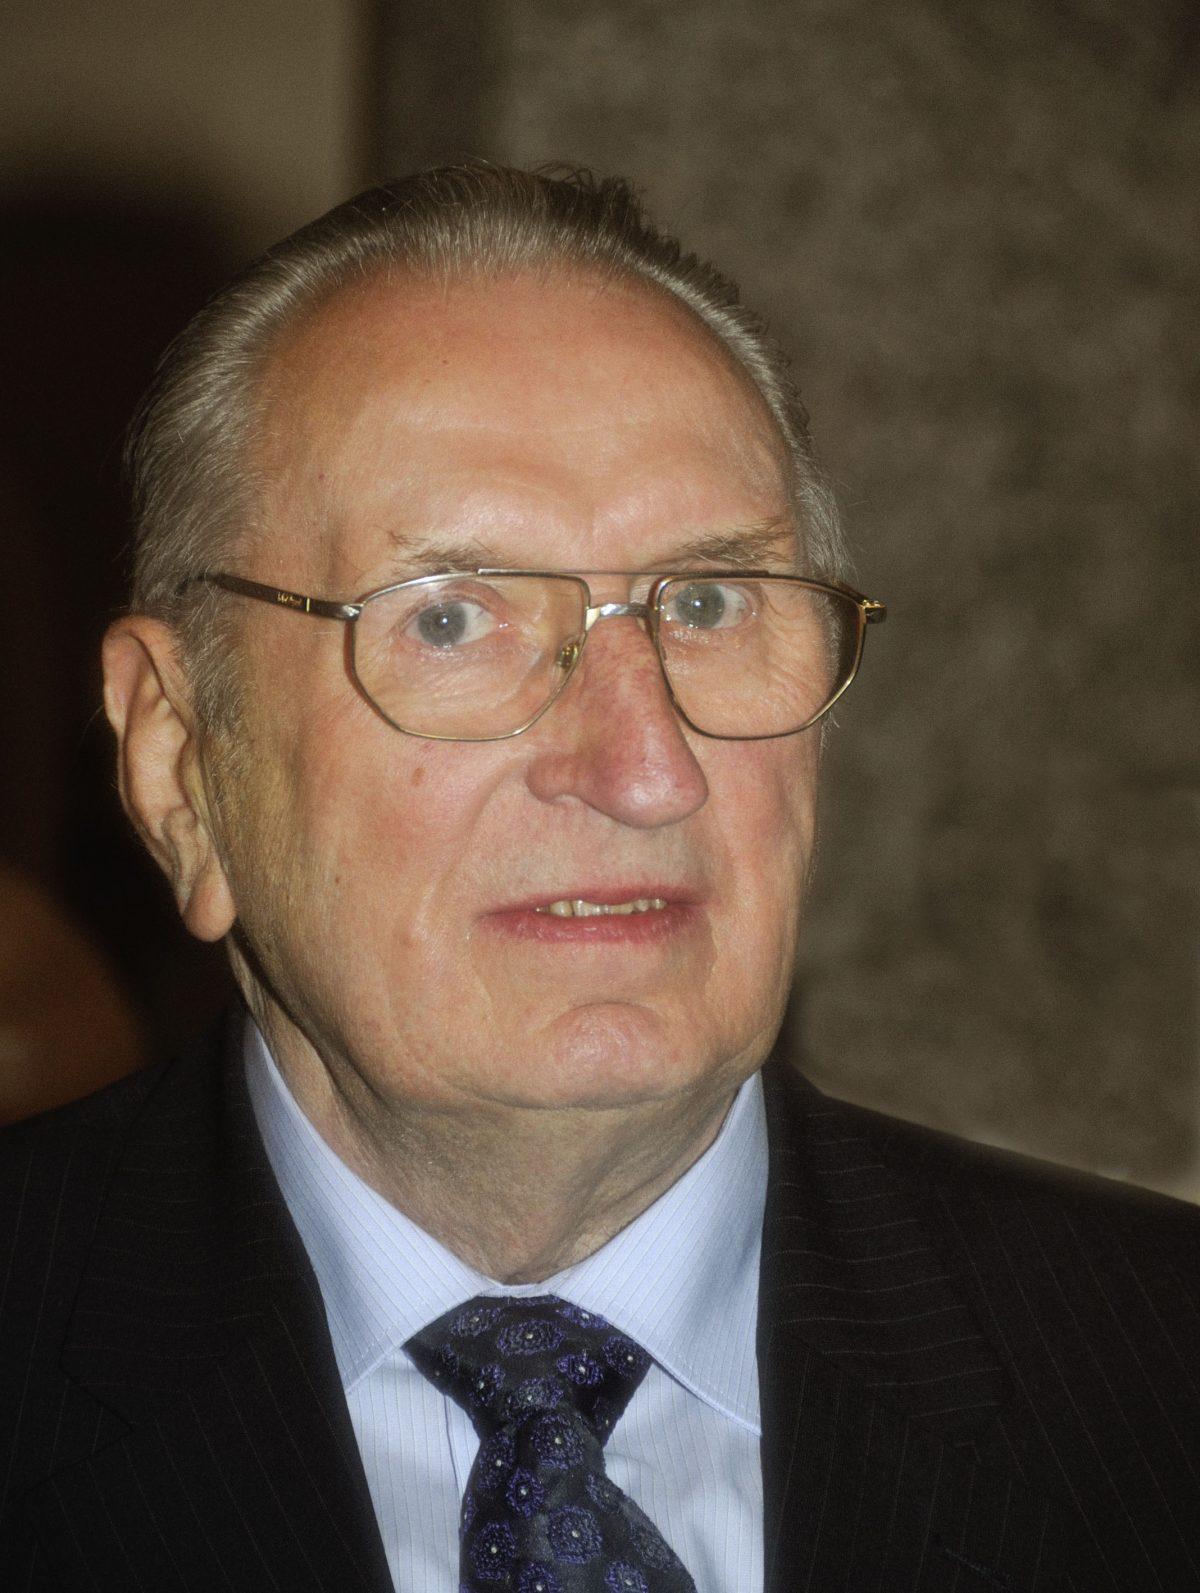 Albert Lindelauf